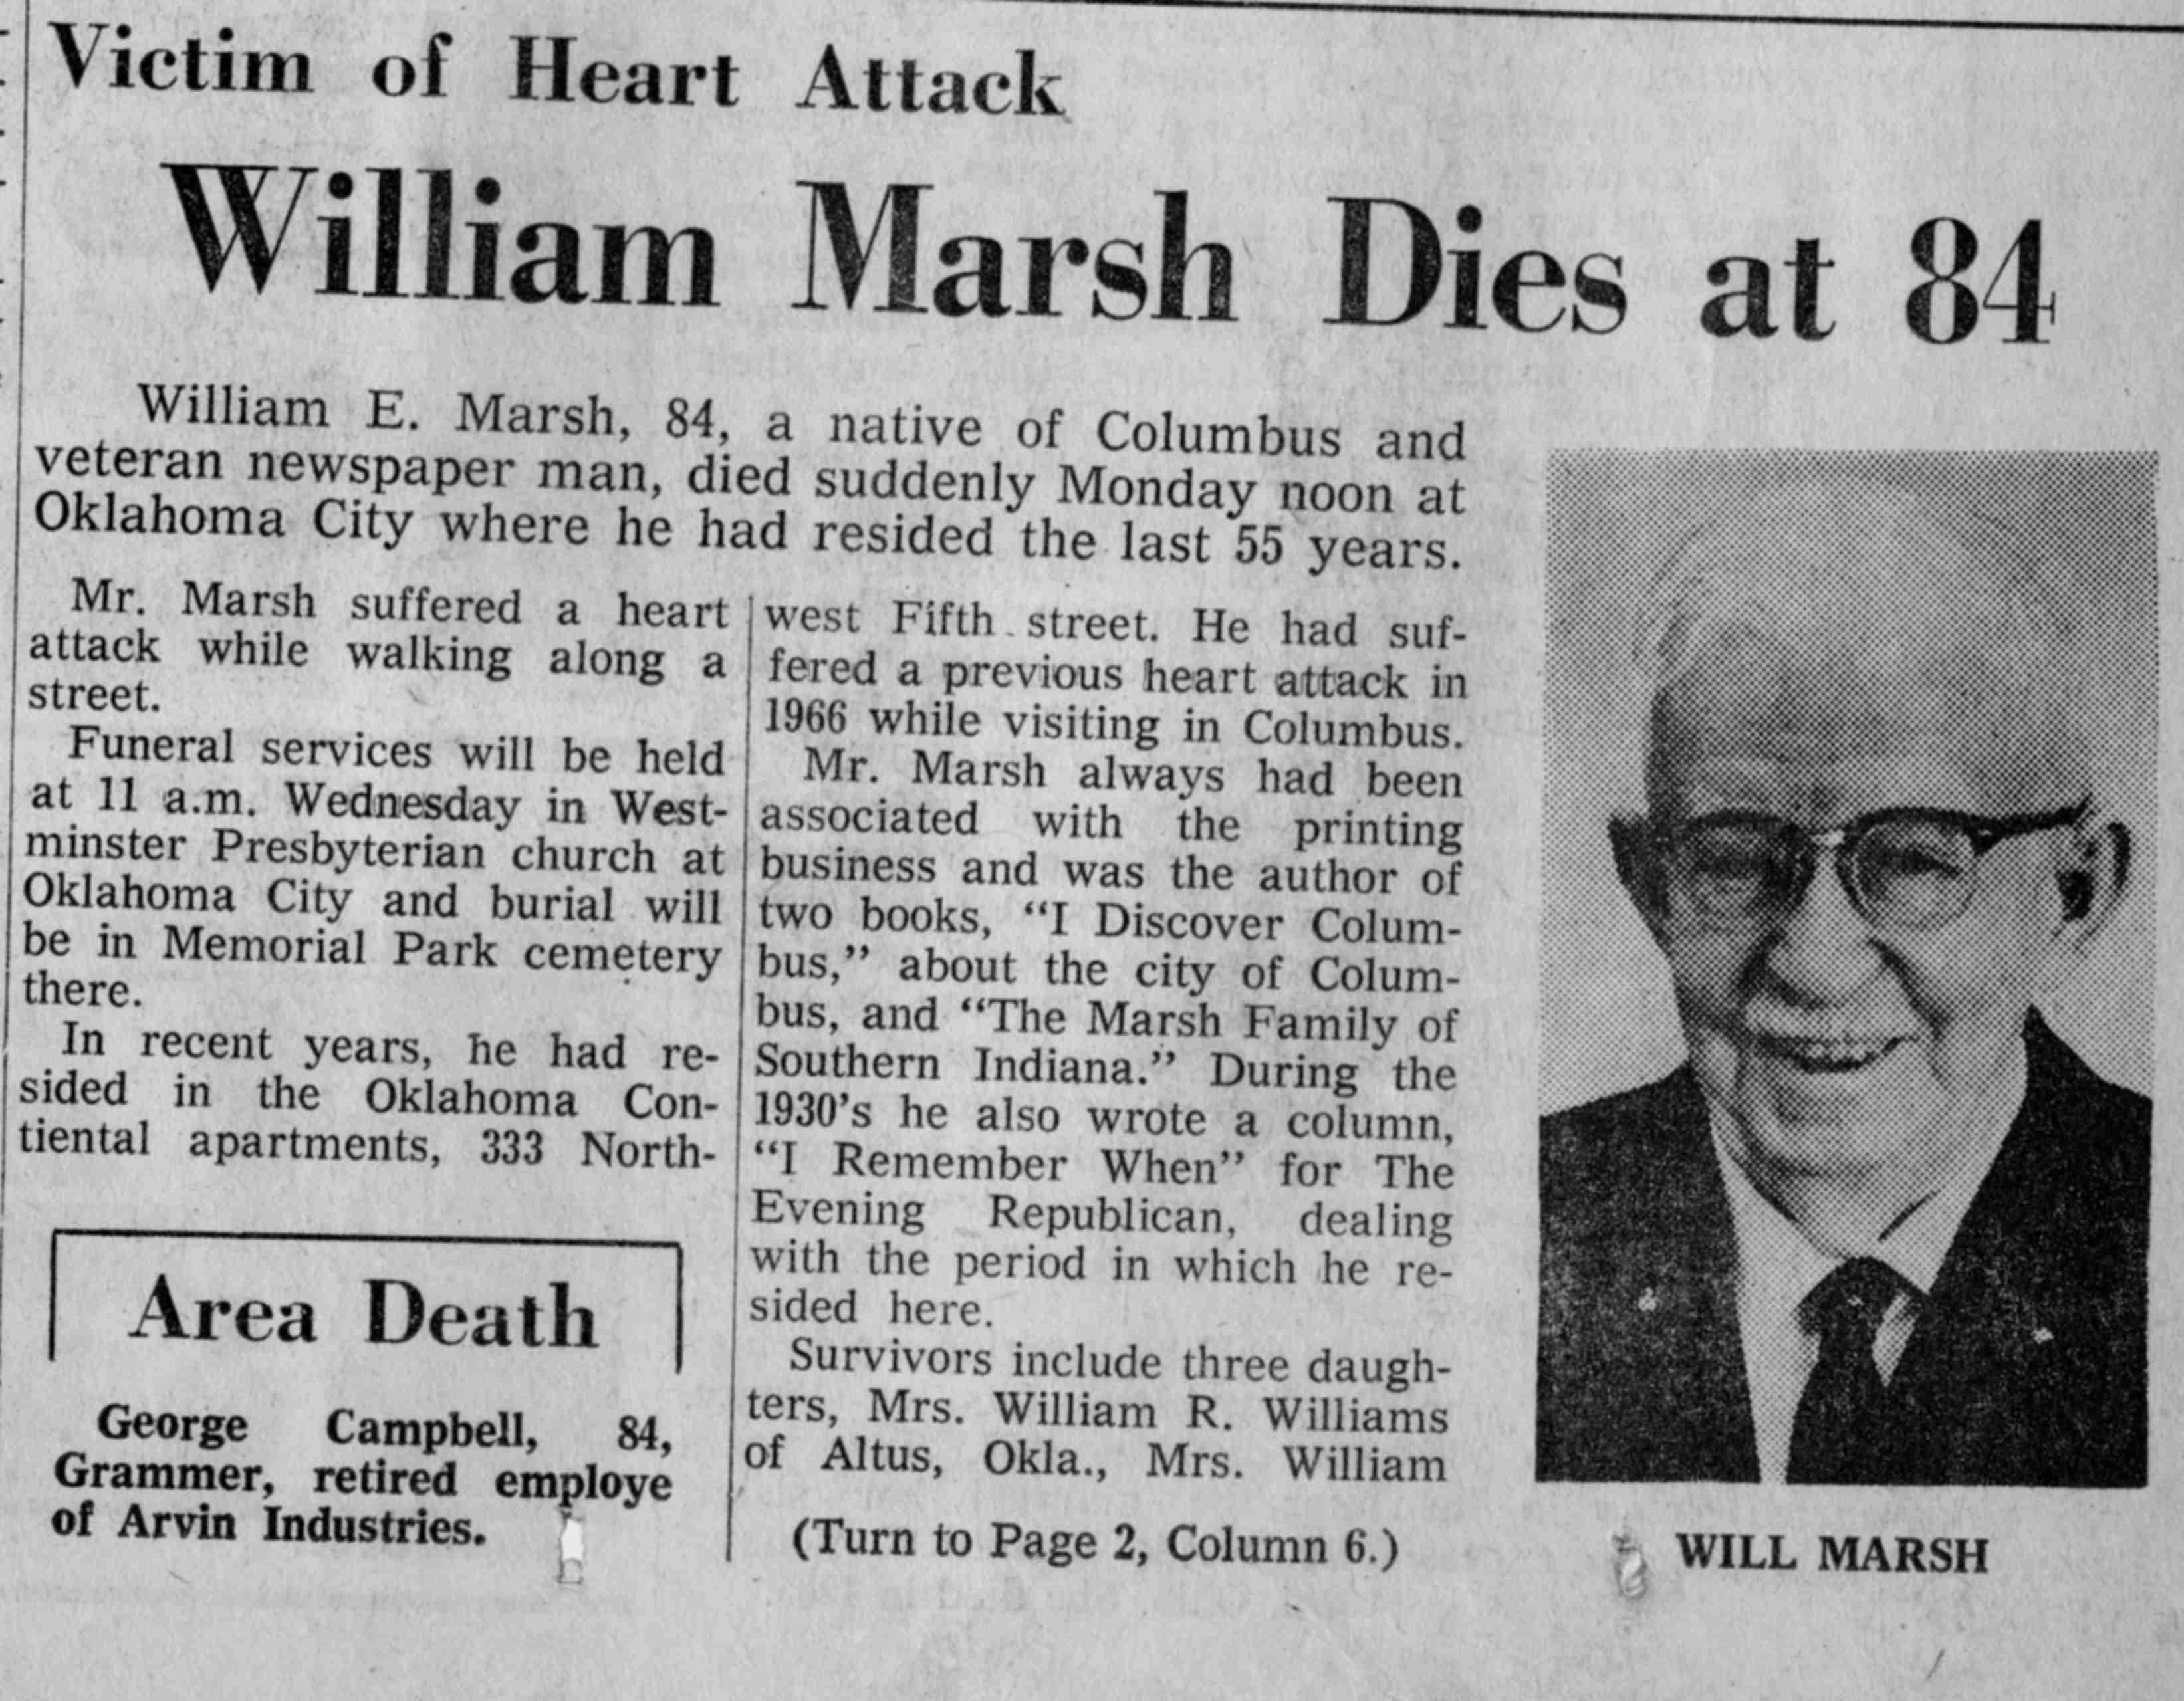 William Edward Marsh